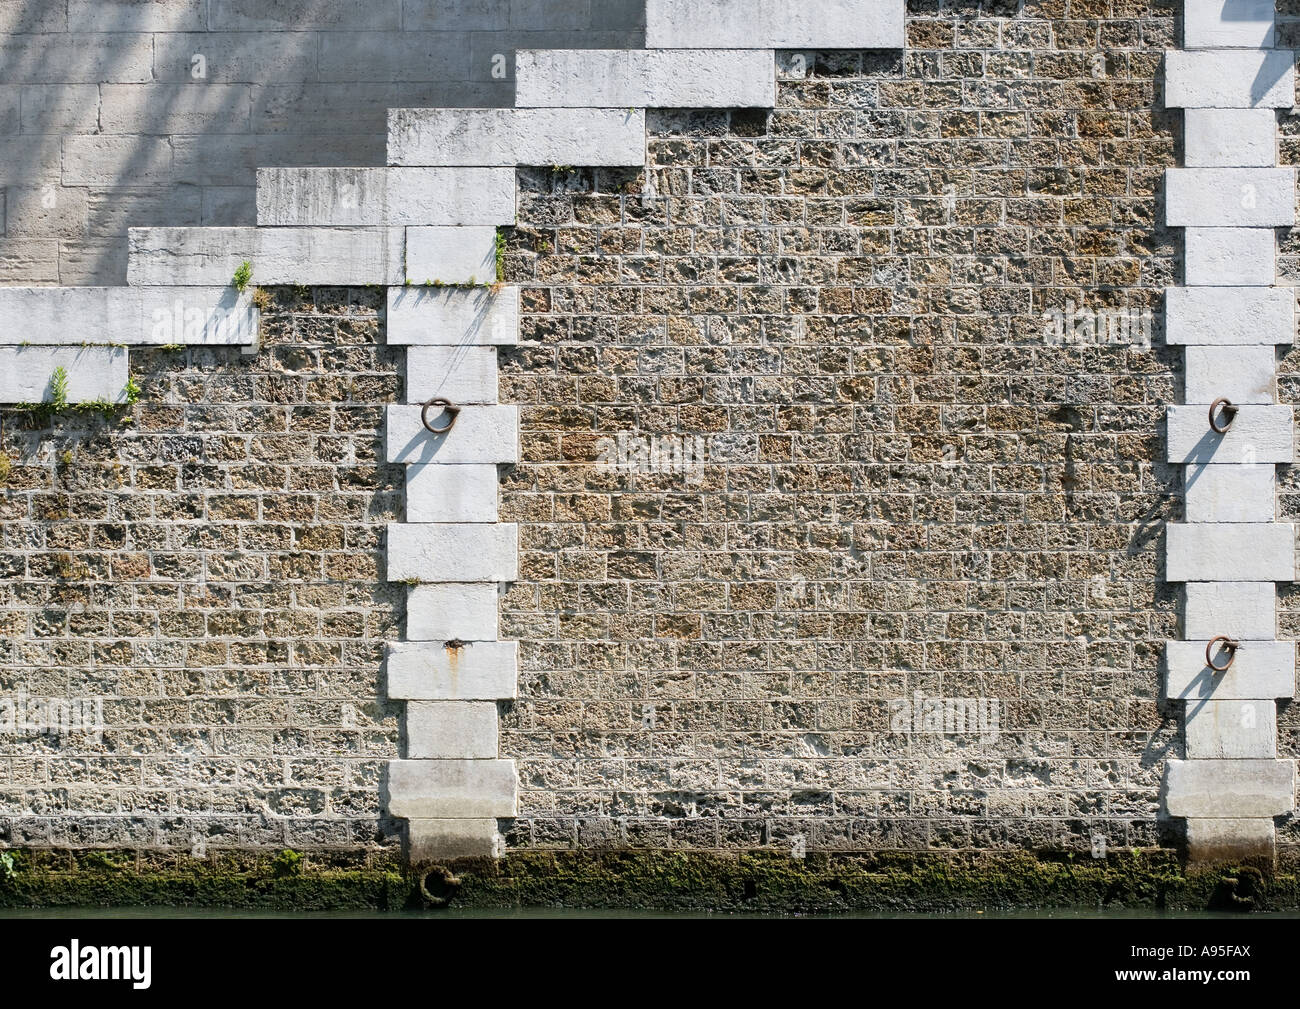 Wall, close-up - Stock Image